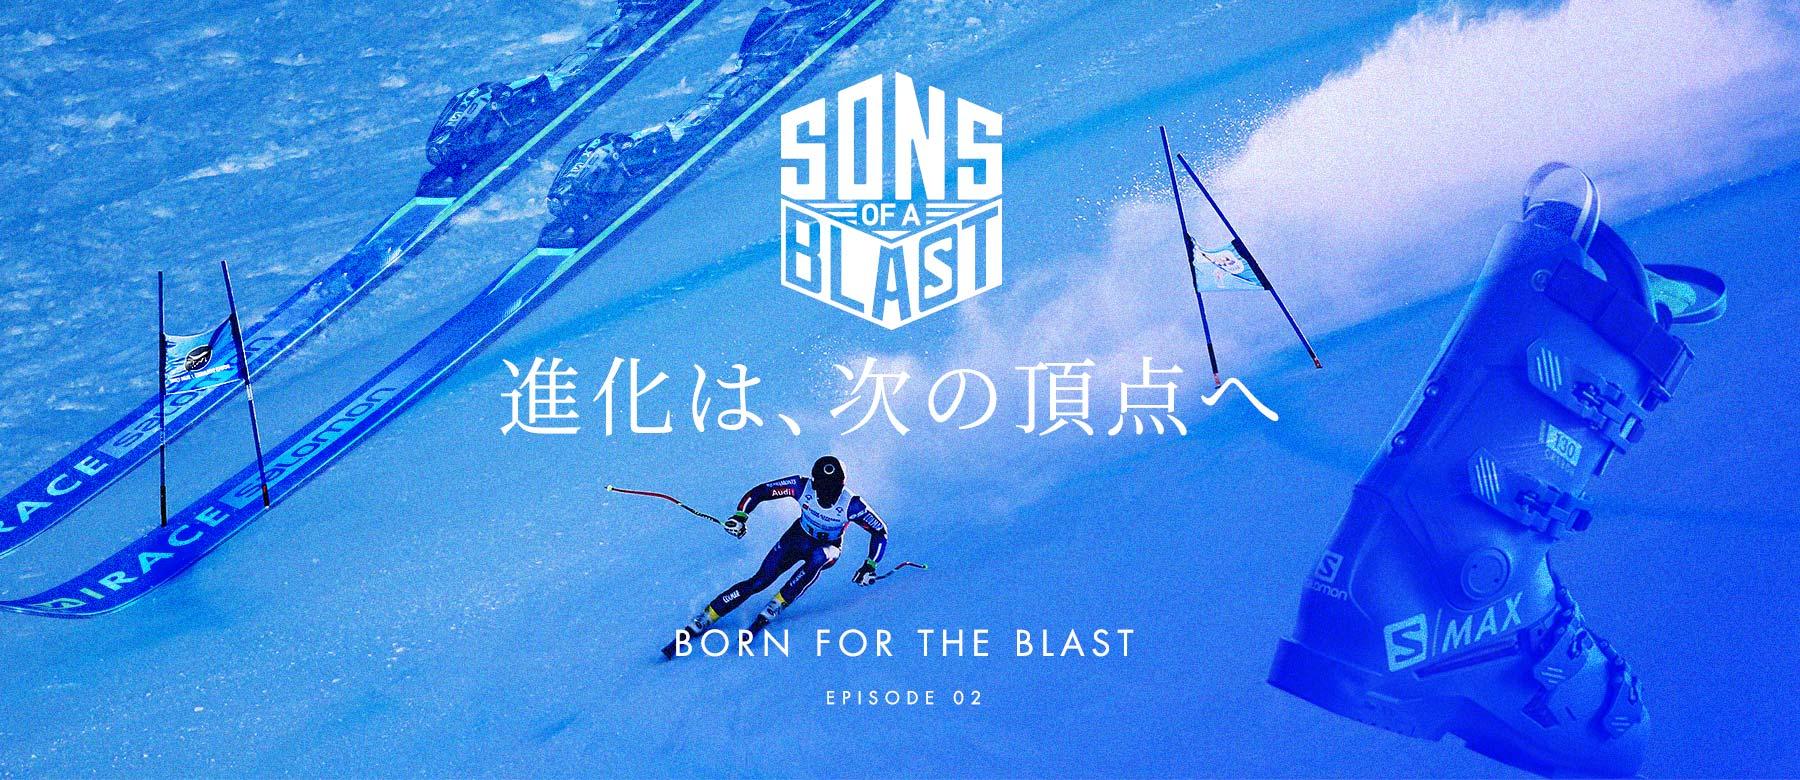 salomon ski 2018 19 blast time to play by salomon japan. Black Bedroom Furniture Sets. Home Design Ideas